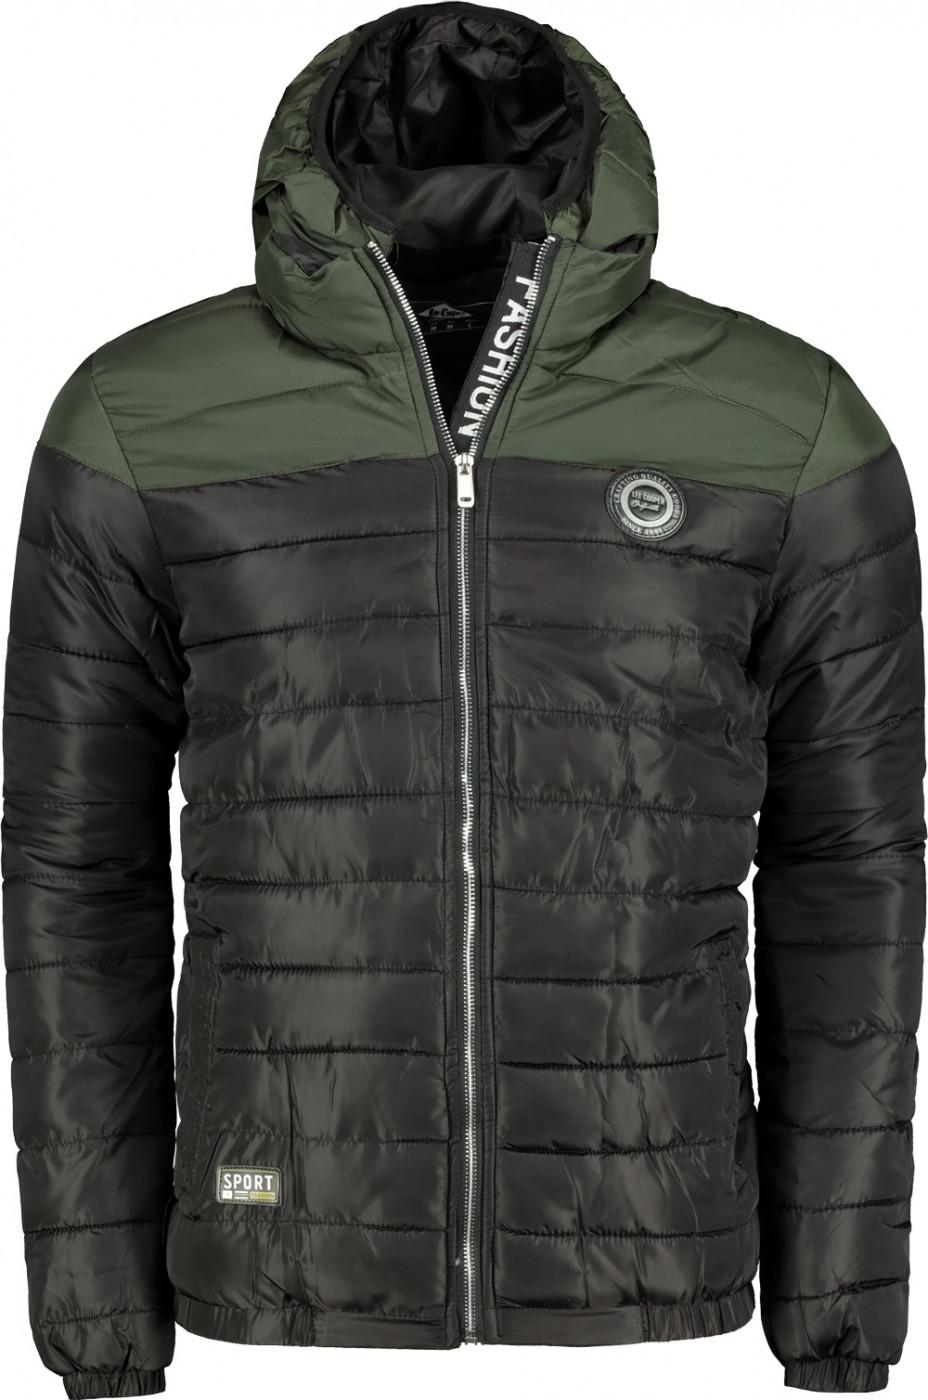 Lee Cooper Fashion Hooded Jacket Mens